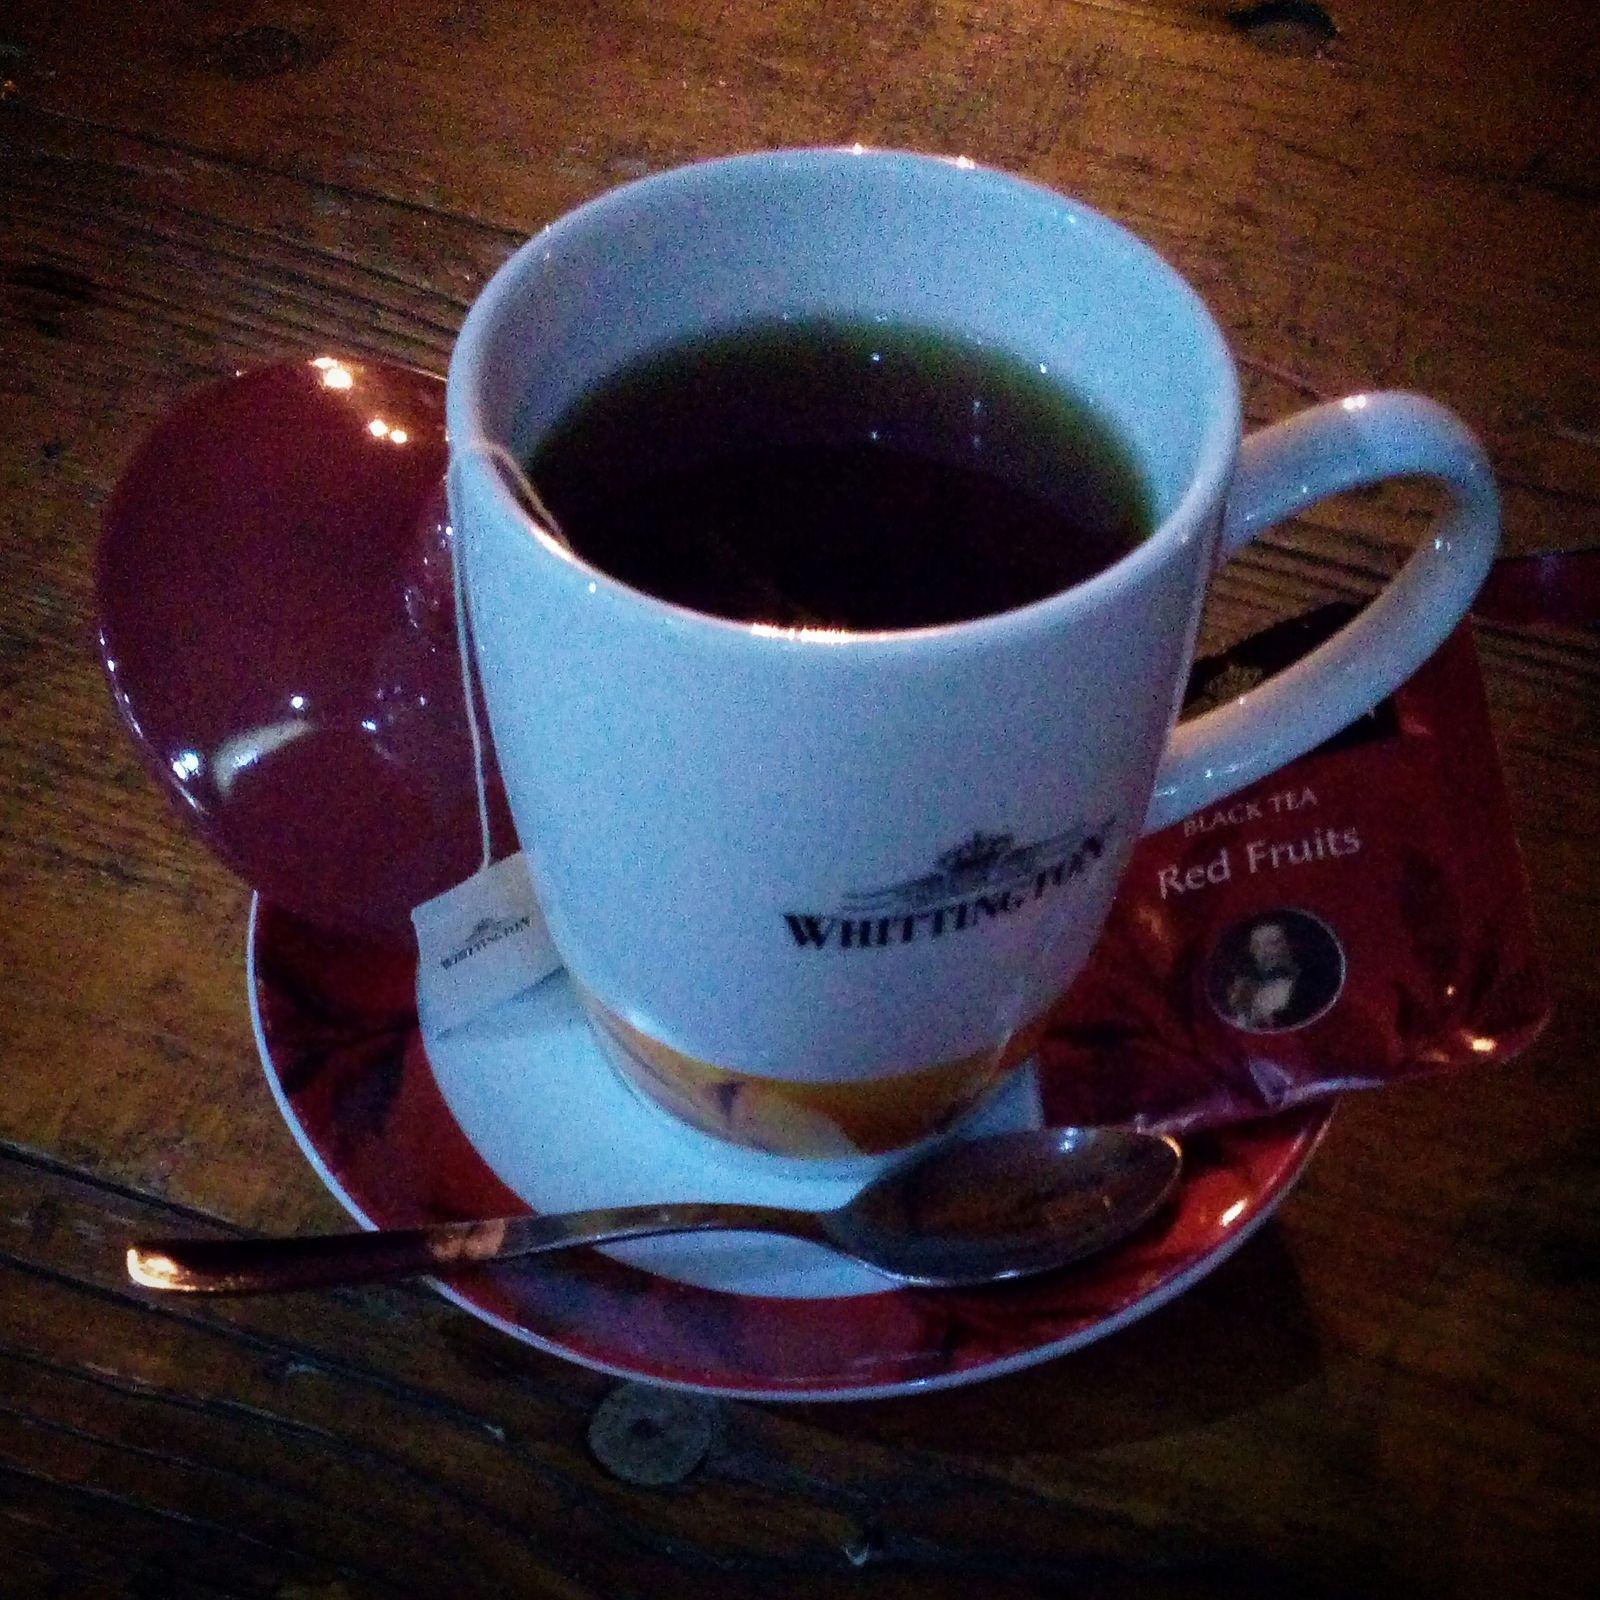 https://flic.kr/p/yAeHX6 | Red Fruits Black Tea |  #MyDailyCupOfTea #tea #tè #cup #teacup #tazza #tazzadate #mug #hottea #tècaldo #instatea #tealover #teaporn #teatime #tealife #teaaddict #LoveGoodTea #teabreak